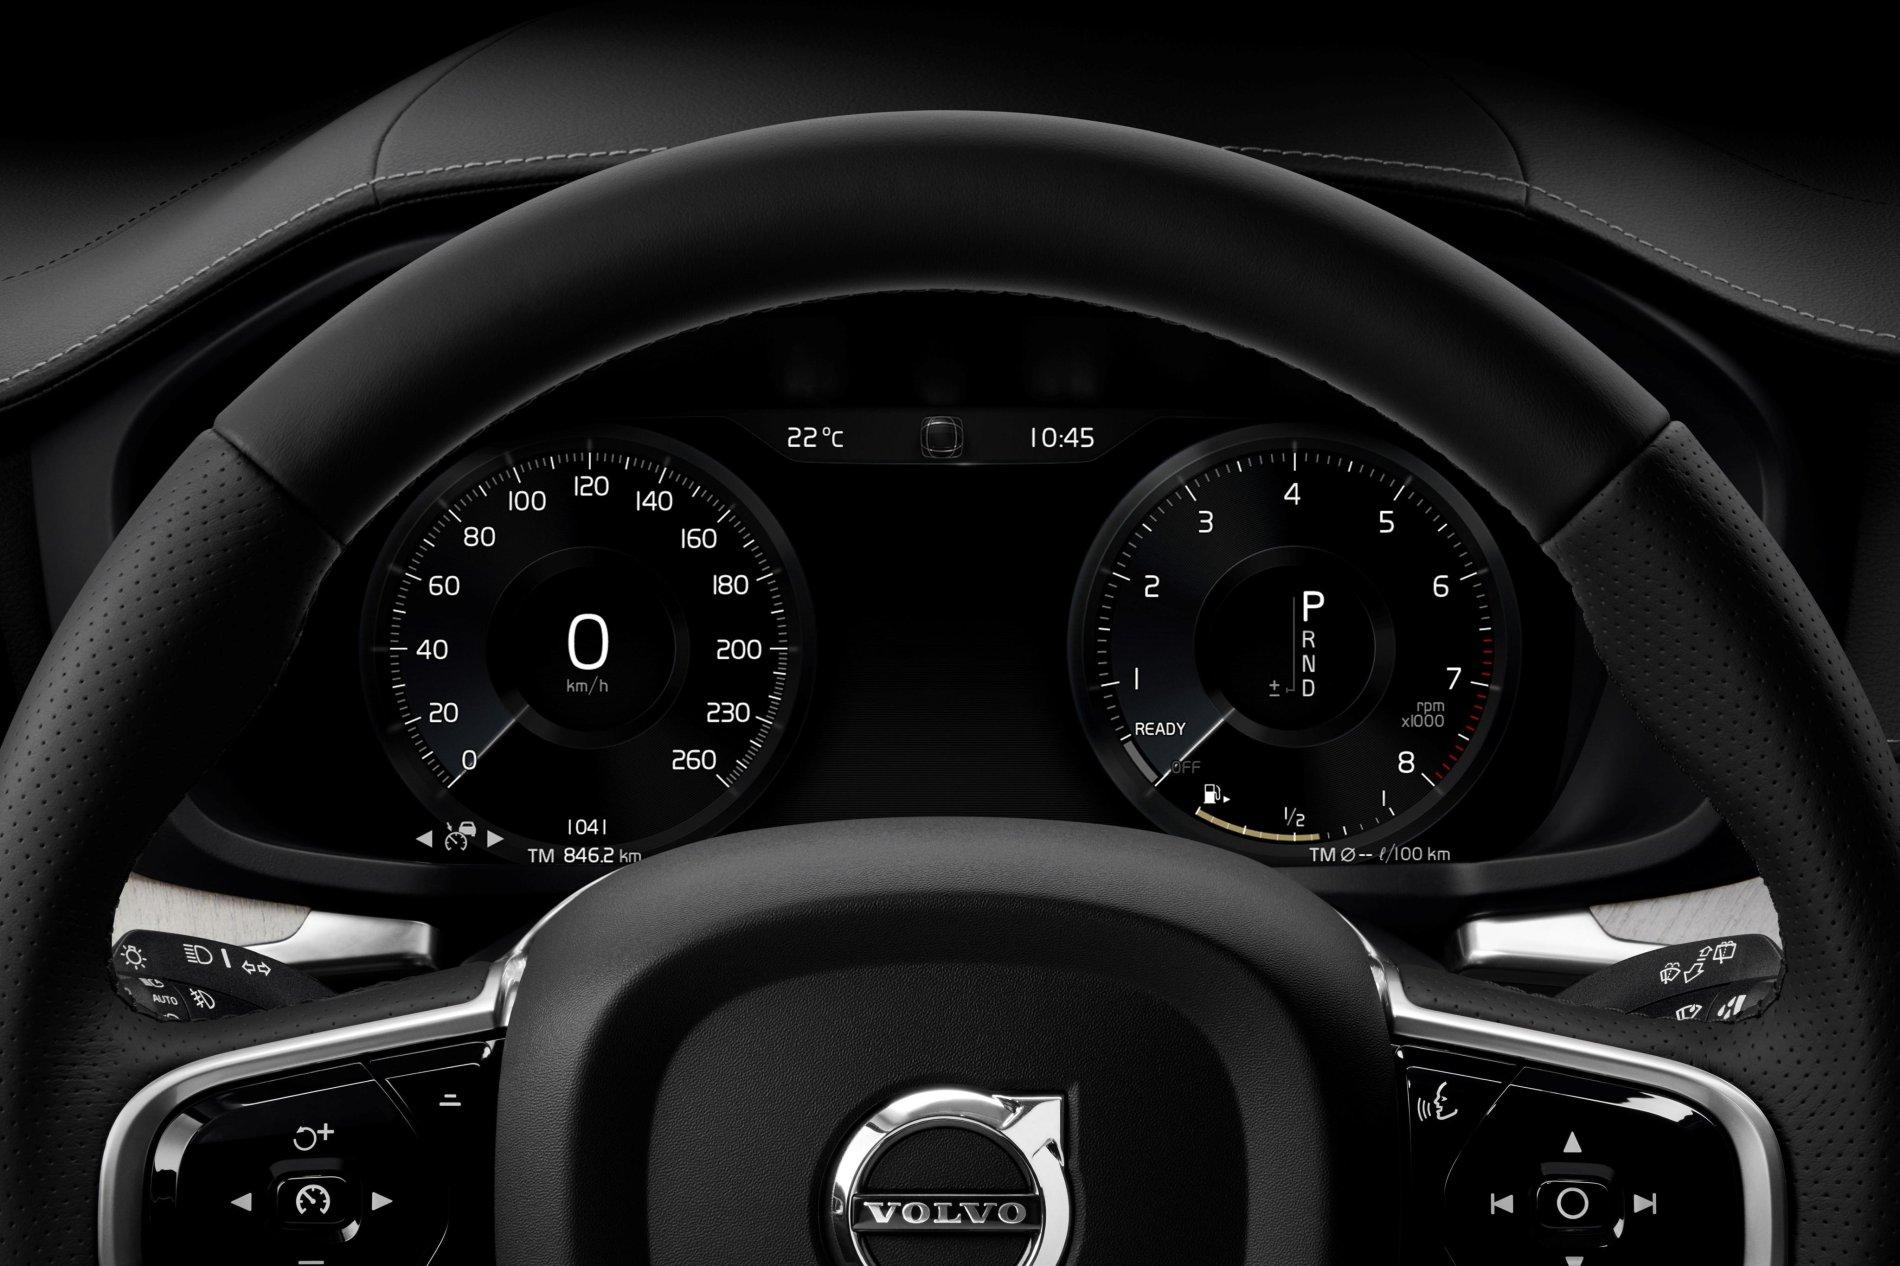 Volvo V60 T6 Inscription - Volvo V60 T6 Inscription